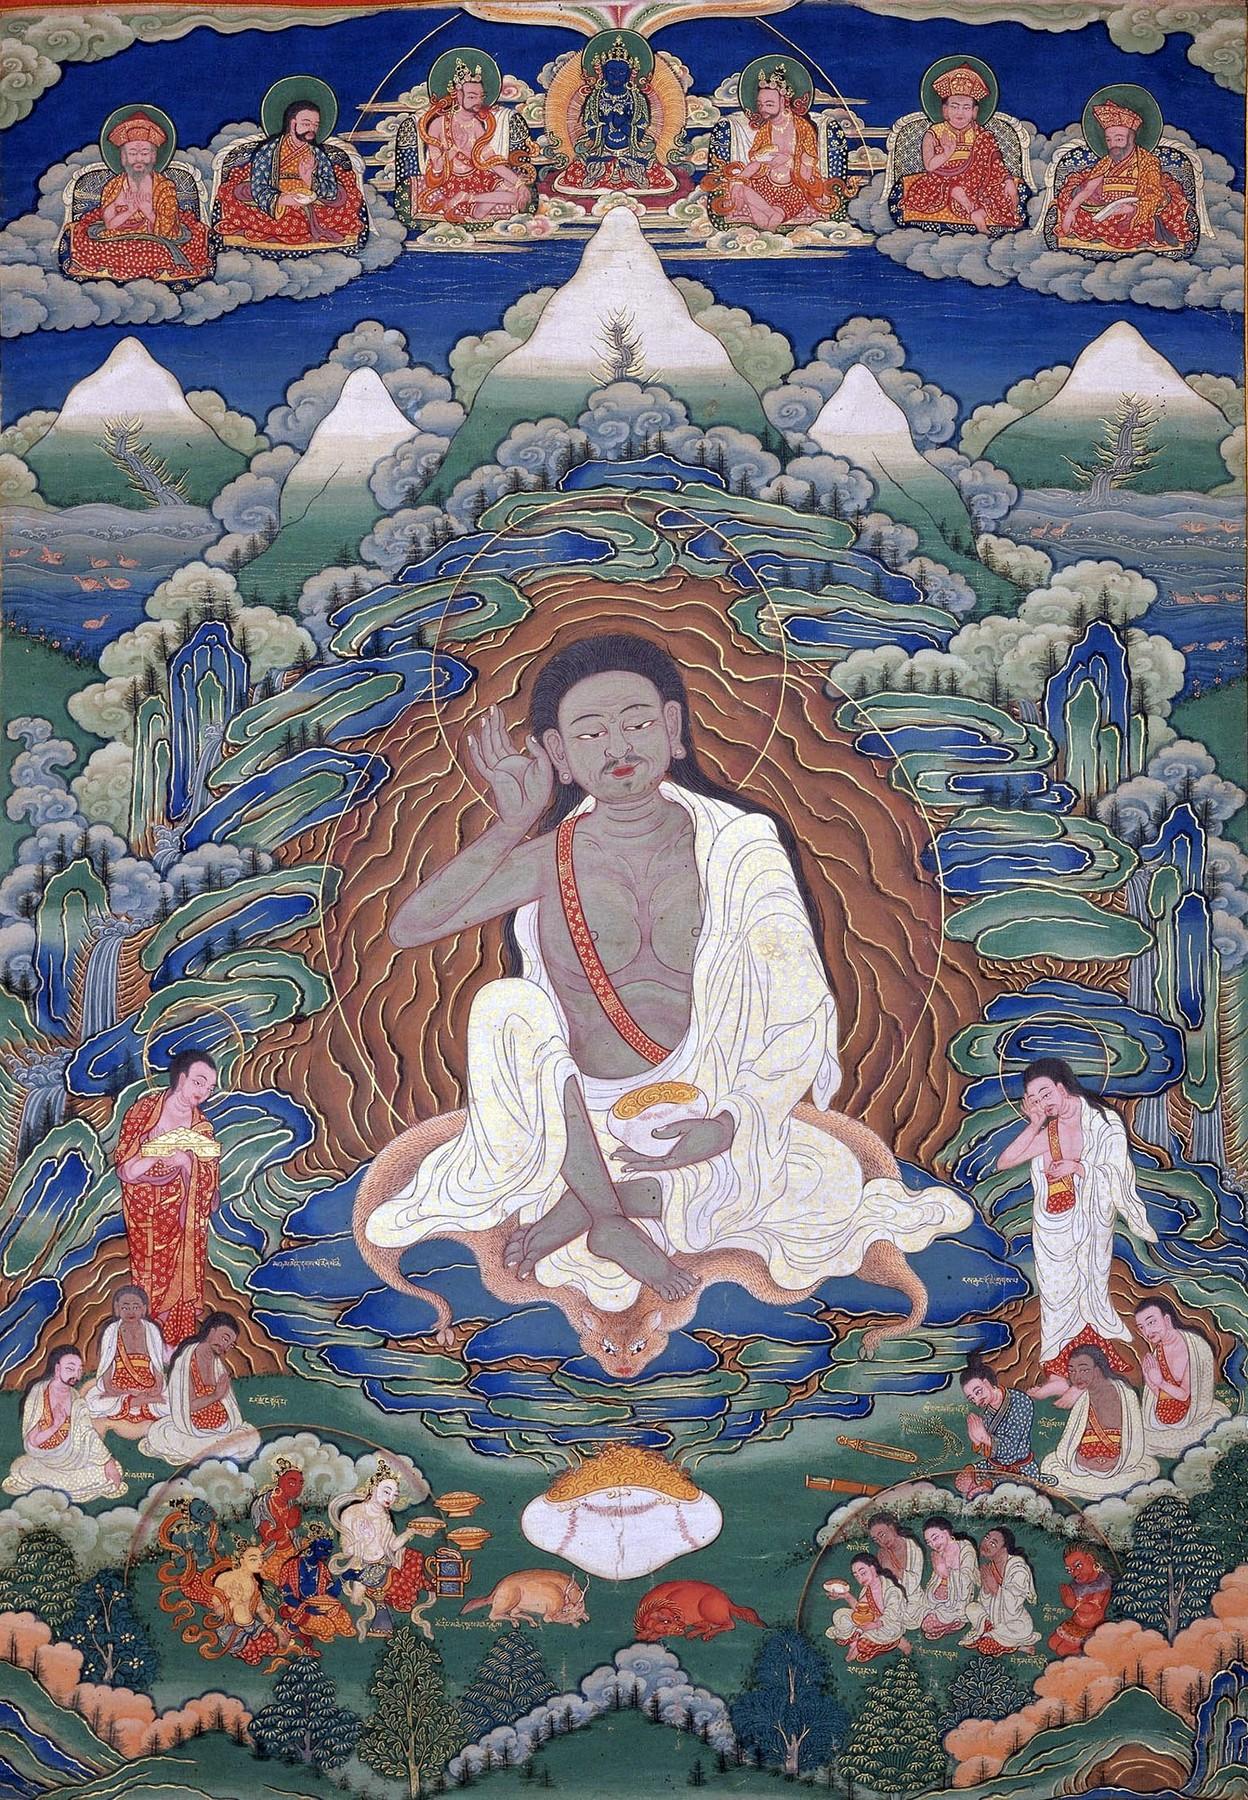 bhutanese_painted_thanka_of_milarepa_-1052-1135-_late_19th-early_20th_century-_dhodeydrag_gonpa-_thimphu-_bhutan.jpg